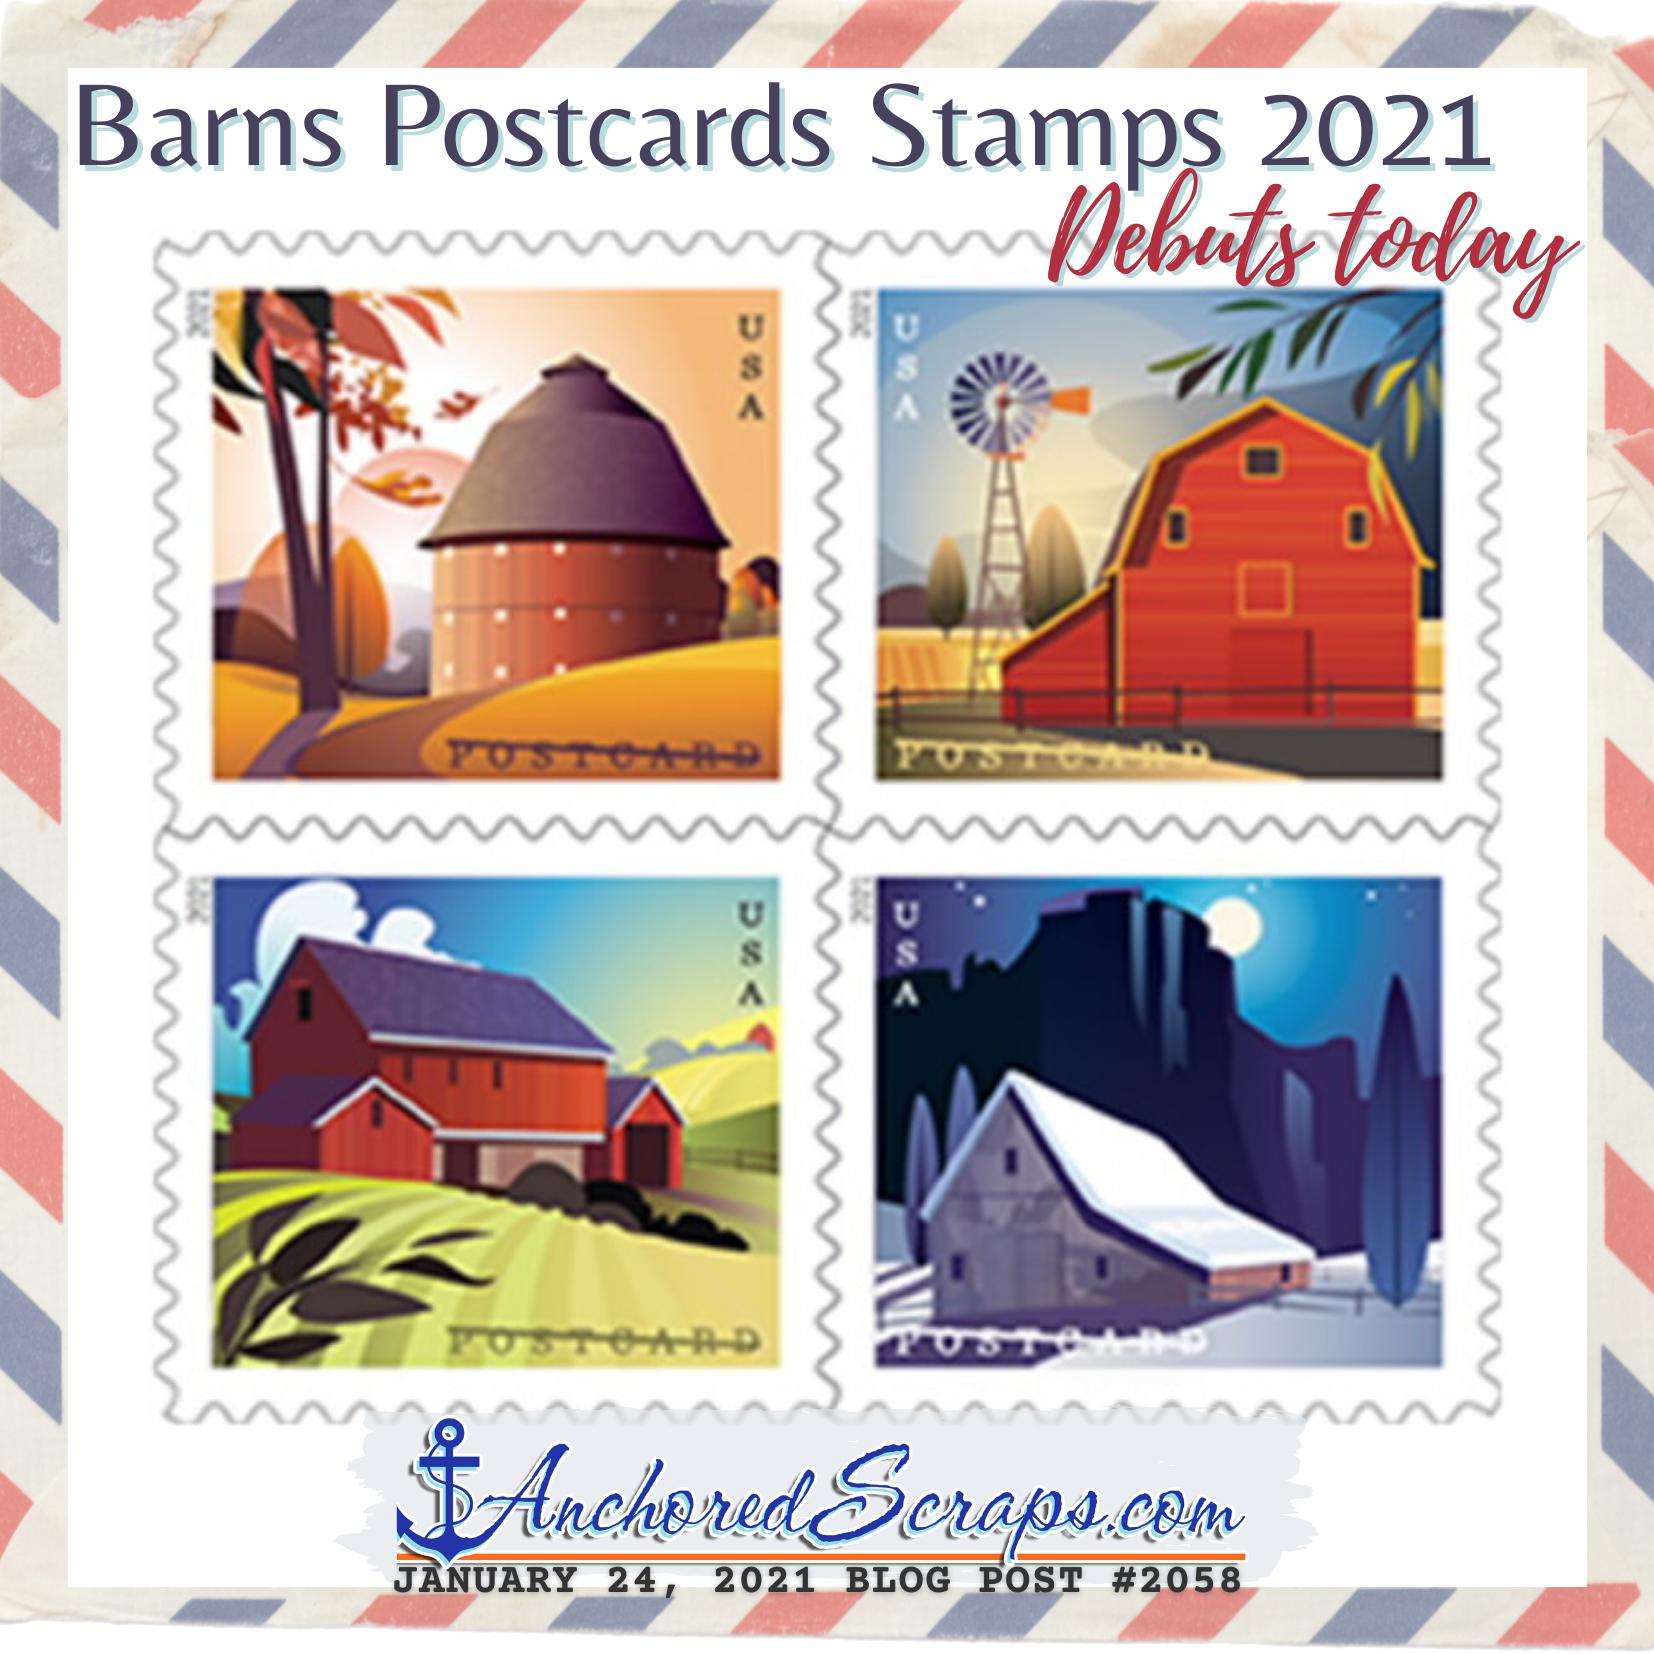 Barns Postcards Stamps 2021